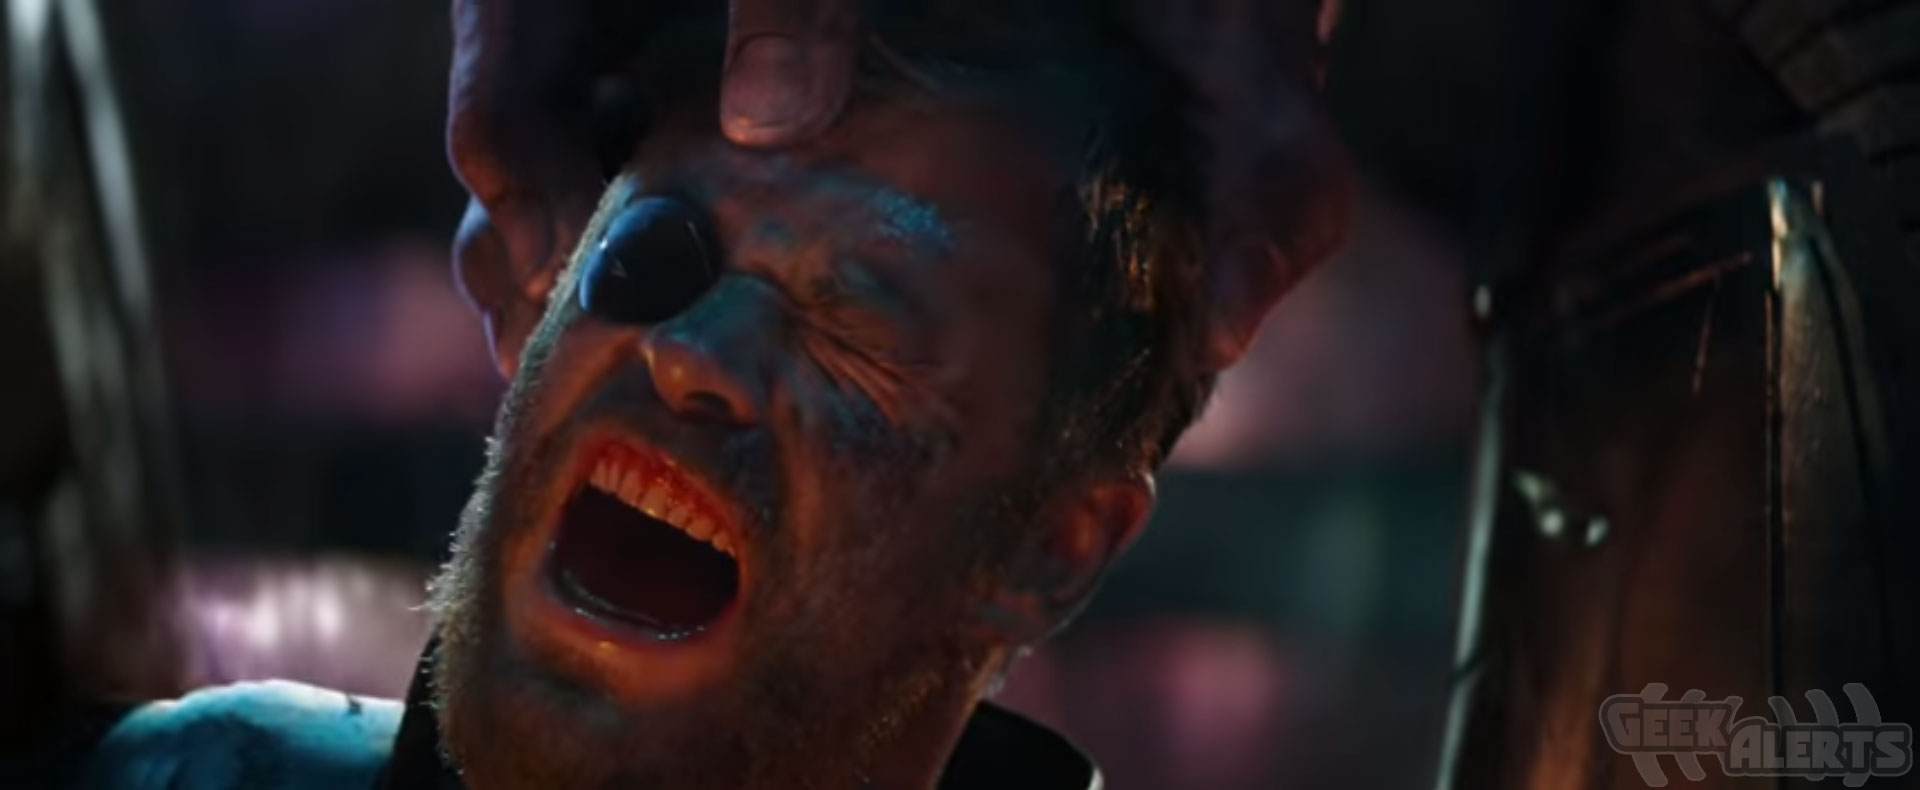 Infinity War Trailer Video